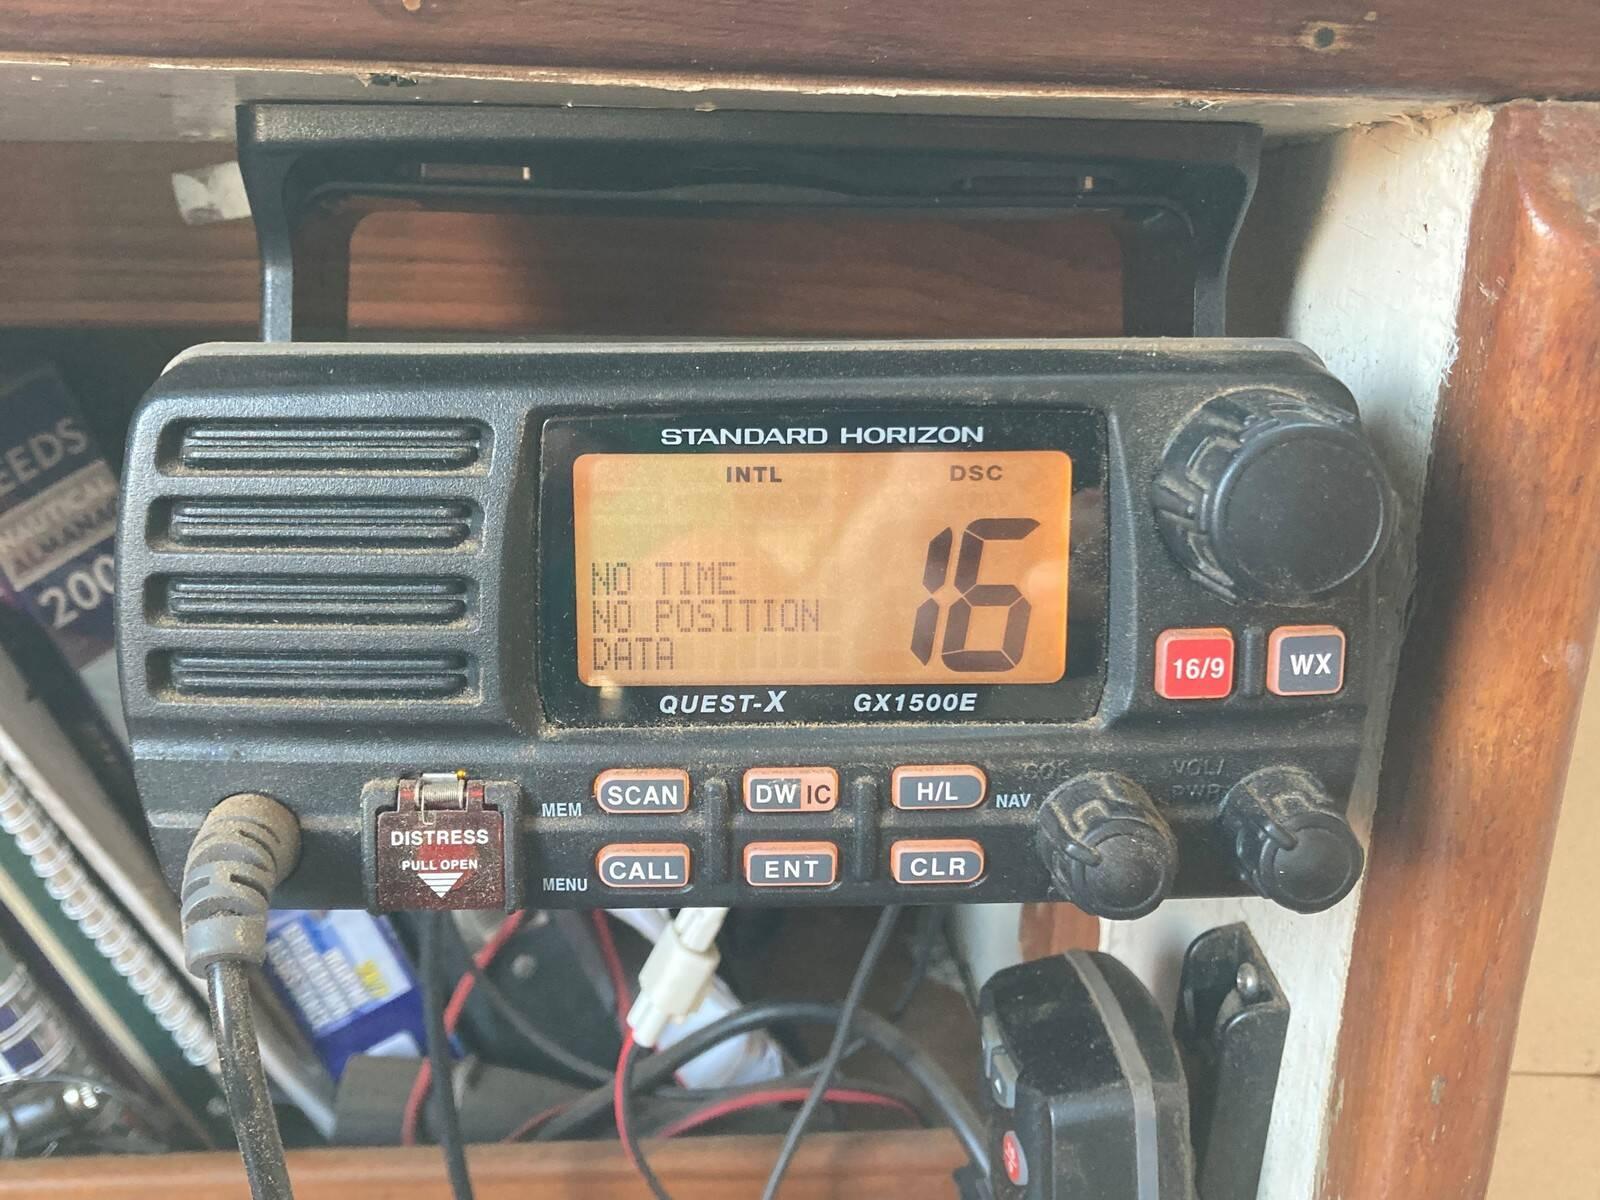 Twister 28 VHF